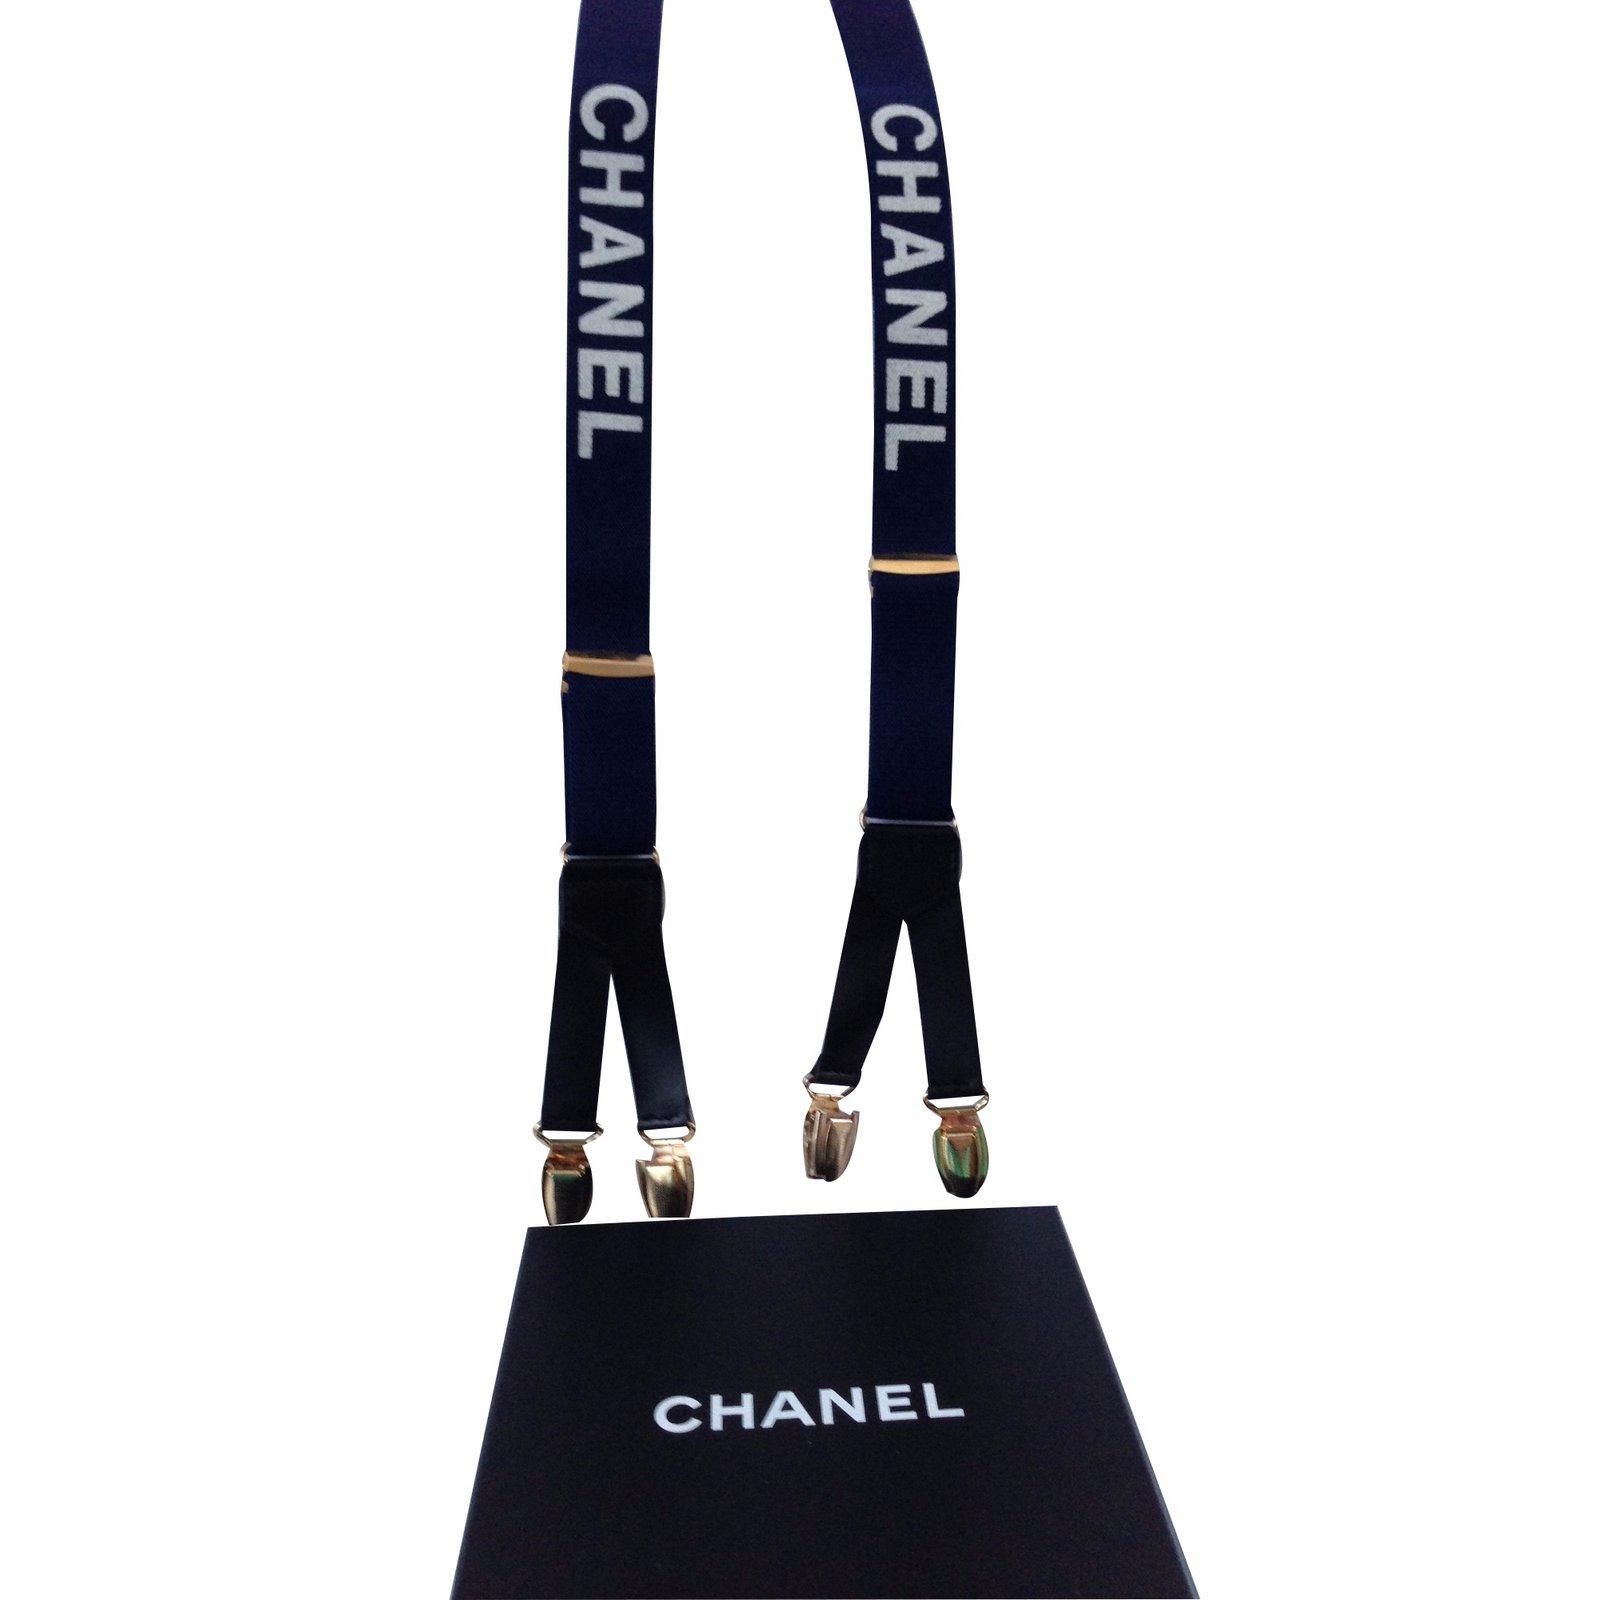 Ceintures Chanel Bretelles Chanel Synthétique Bleu ref.17450 - Joli Closet e4770eda004